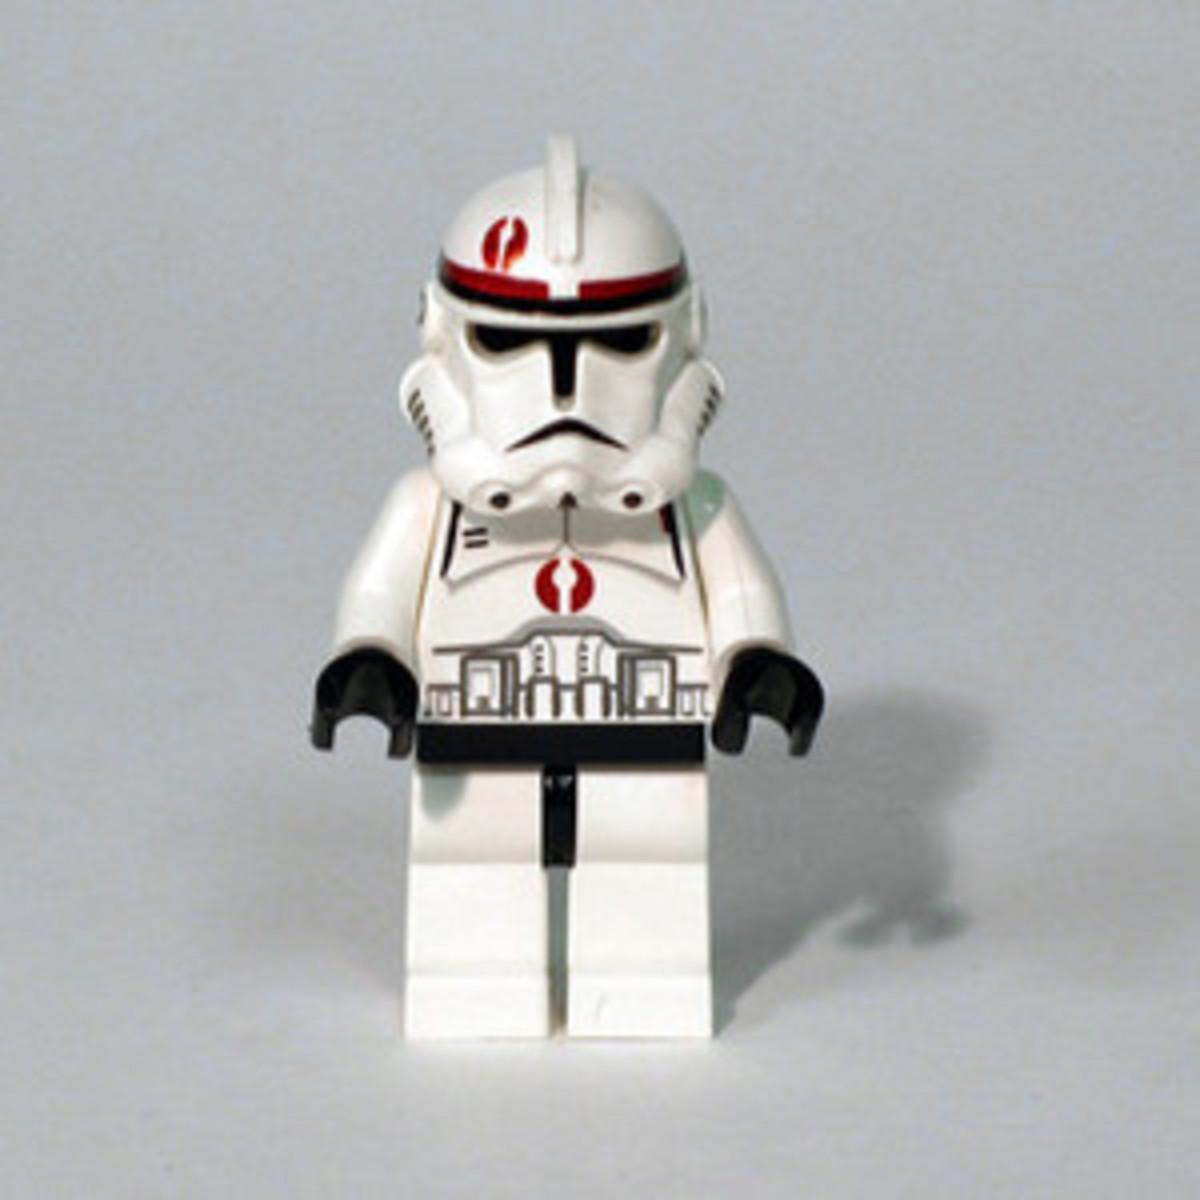 LEGO Star Wars Clone Scout Walker 7250 Clone Recon Trooper Minifigure